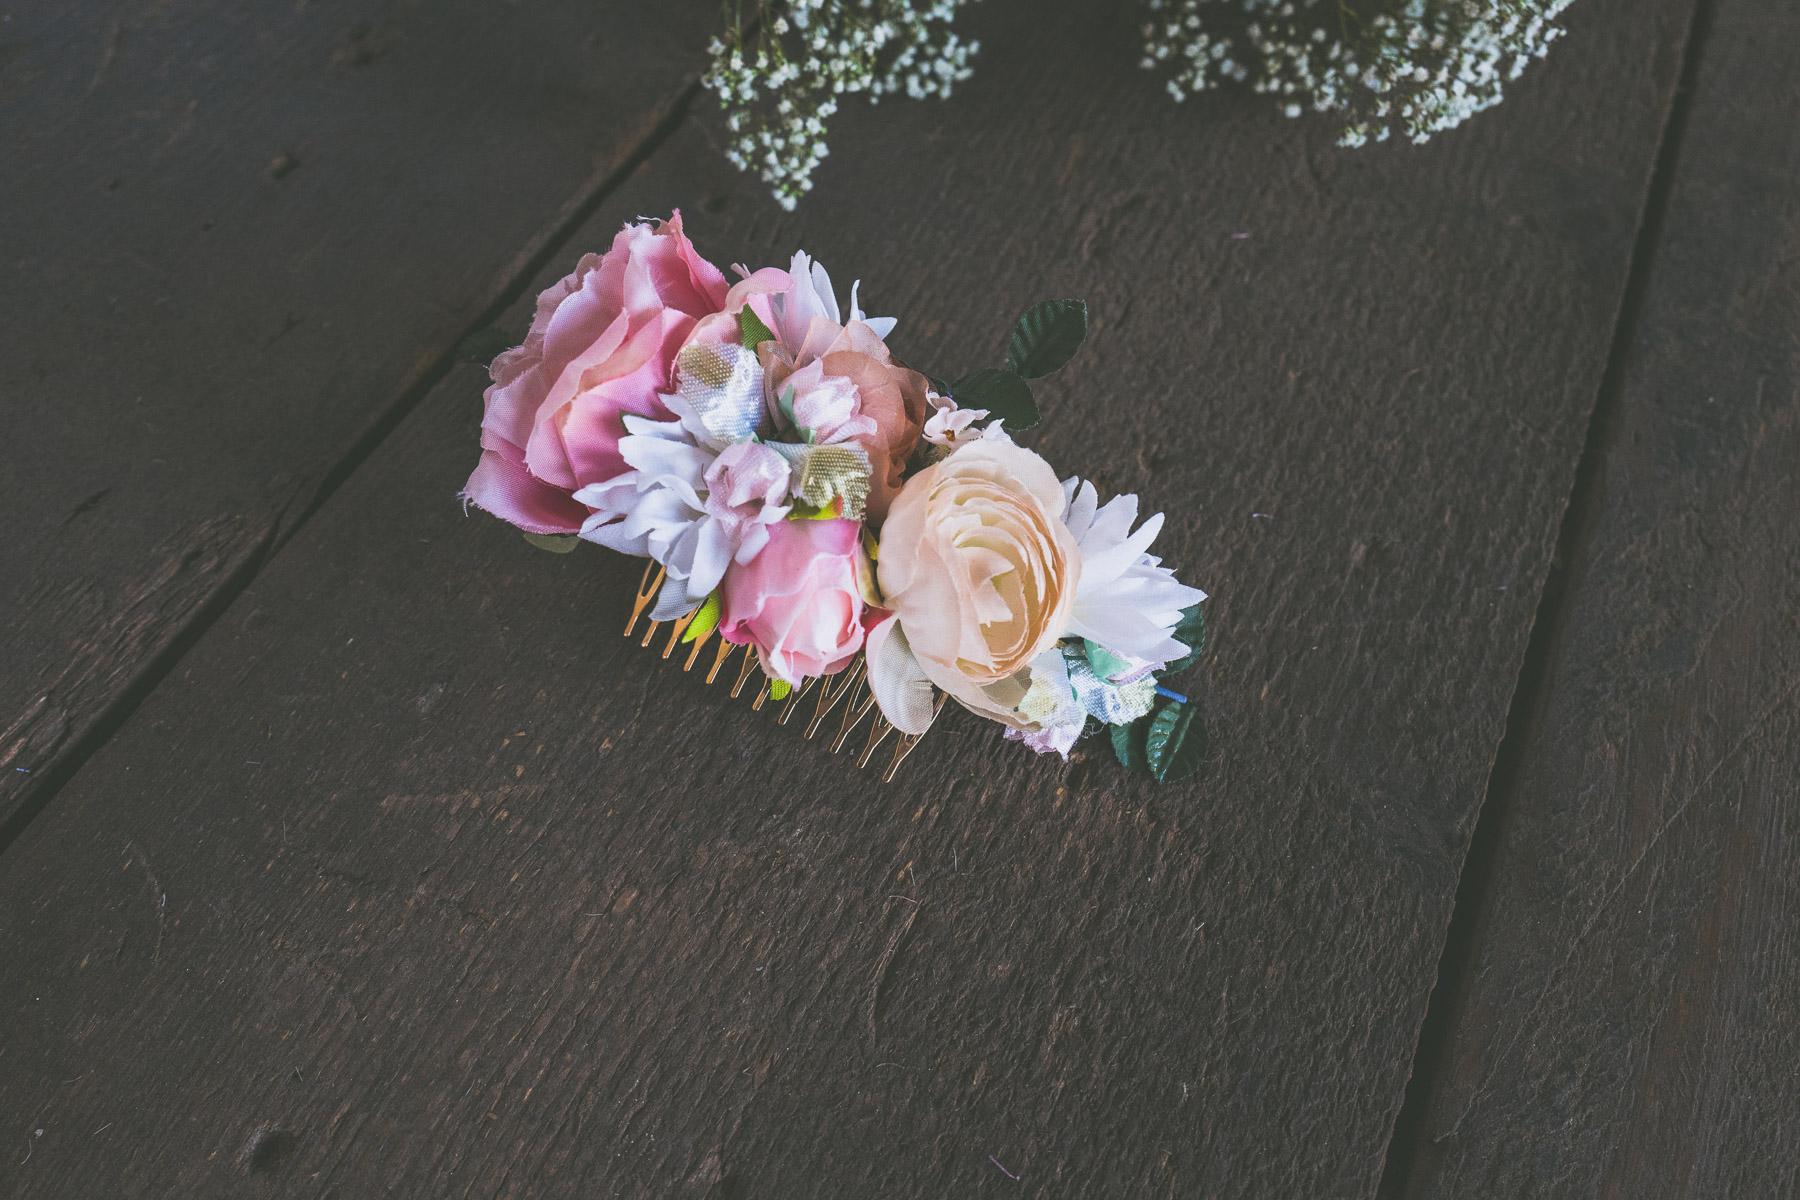 We-Are-Flowergirls_SS17_Couture-Collection_Blumenkranz_Flowercrown_070_1160768.jpg